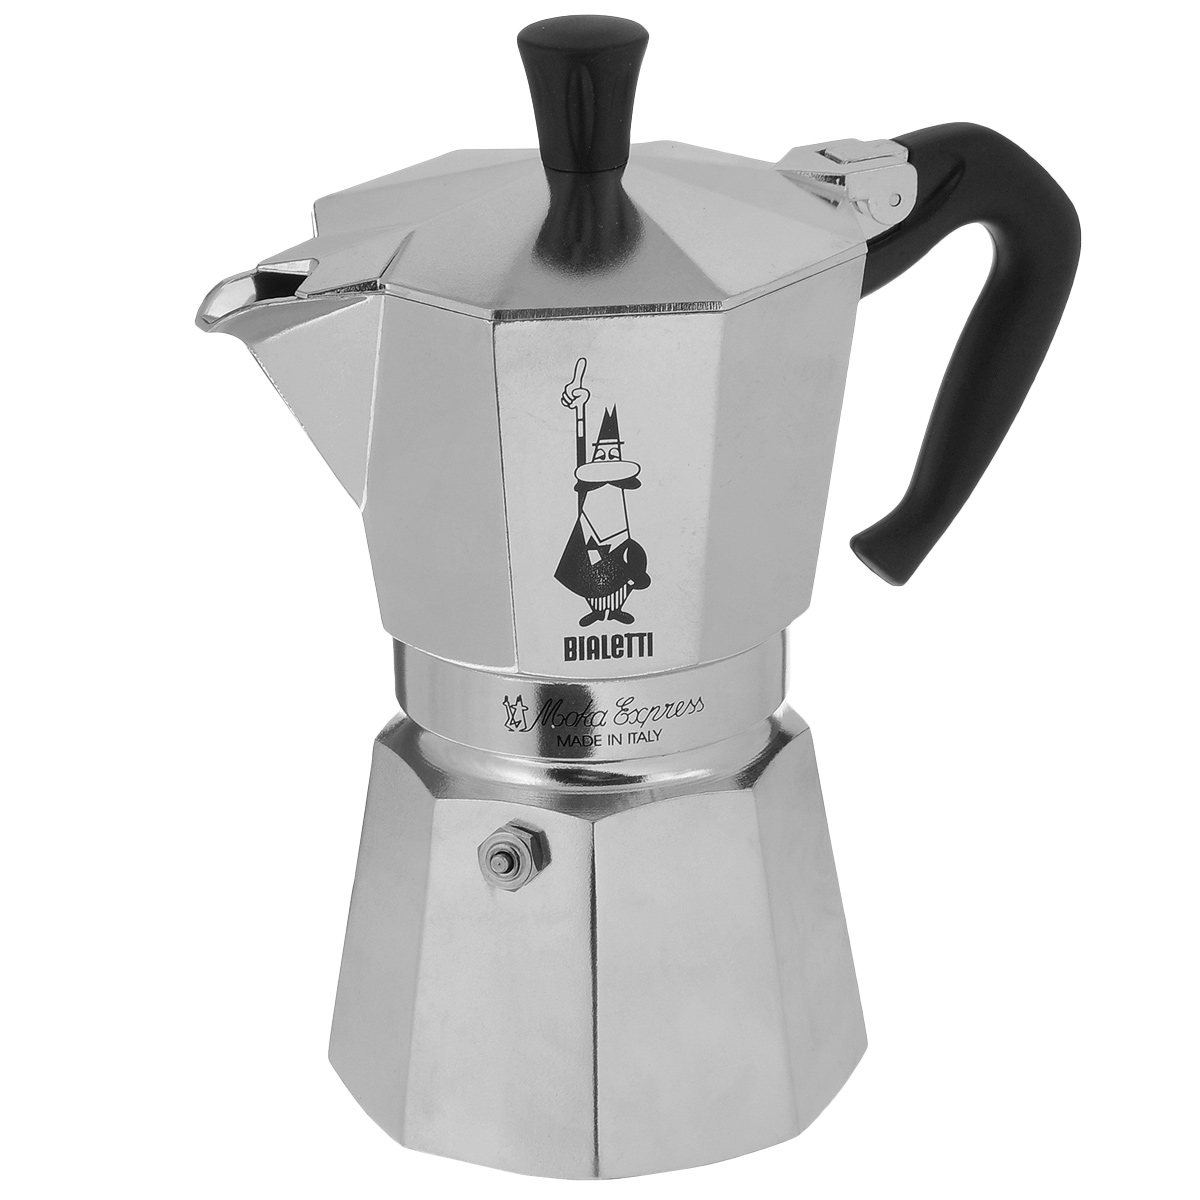 Кофеварка гейзерная Bialetti Moka Express, на 6 чашек, 300 мл